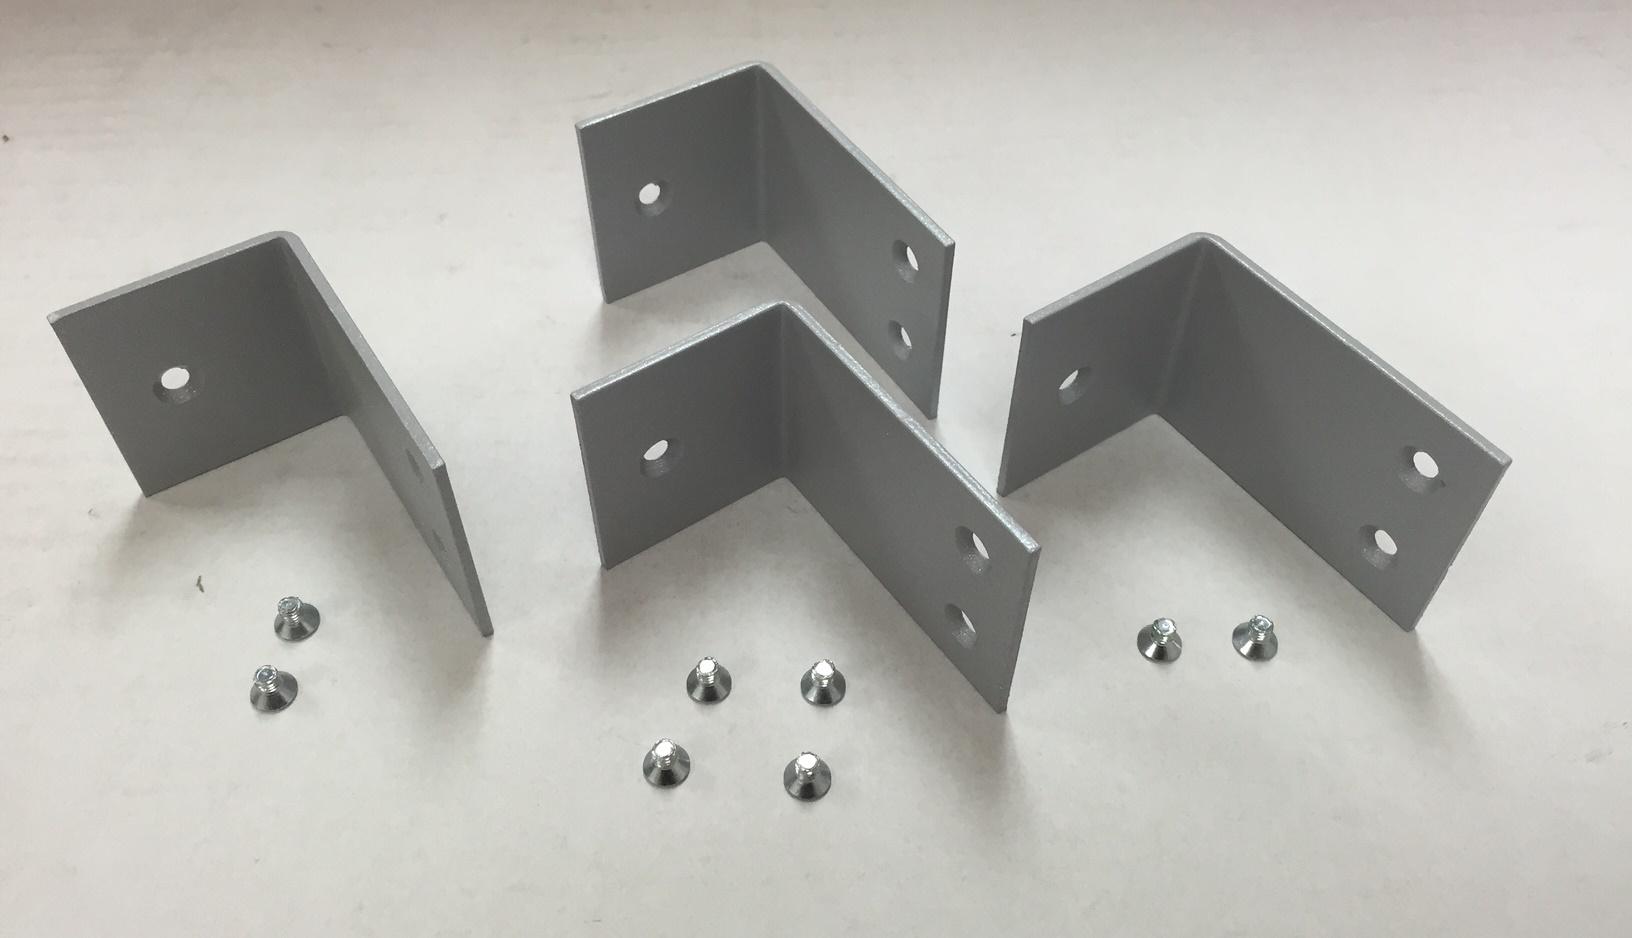 Table-Mount-Set Type 1